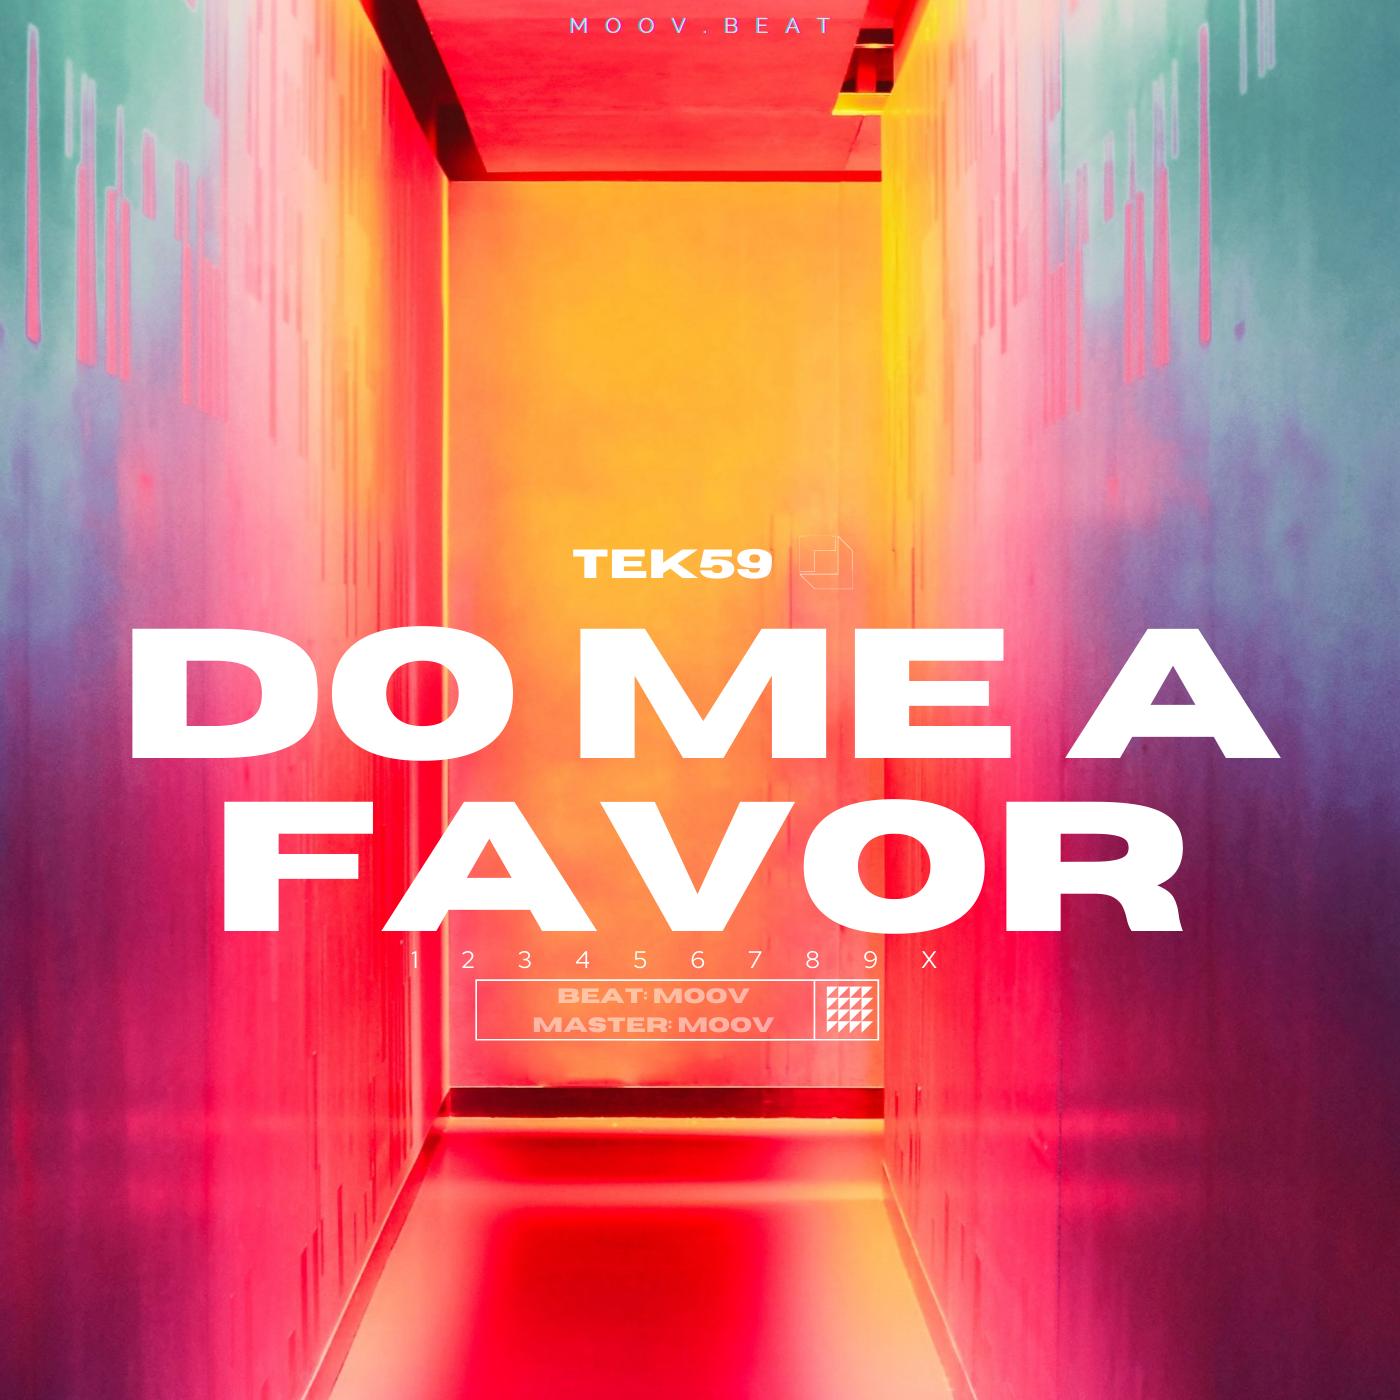 Do me a favor4.png